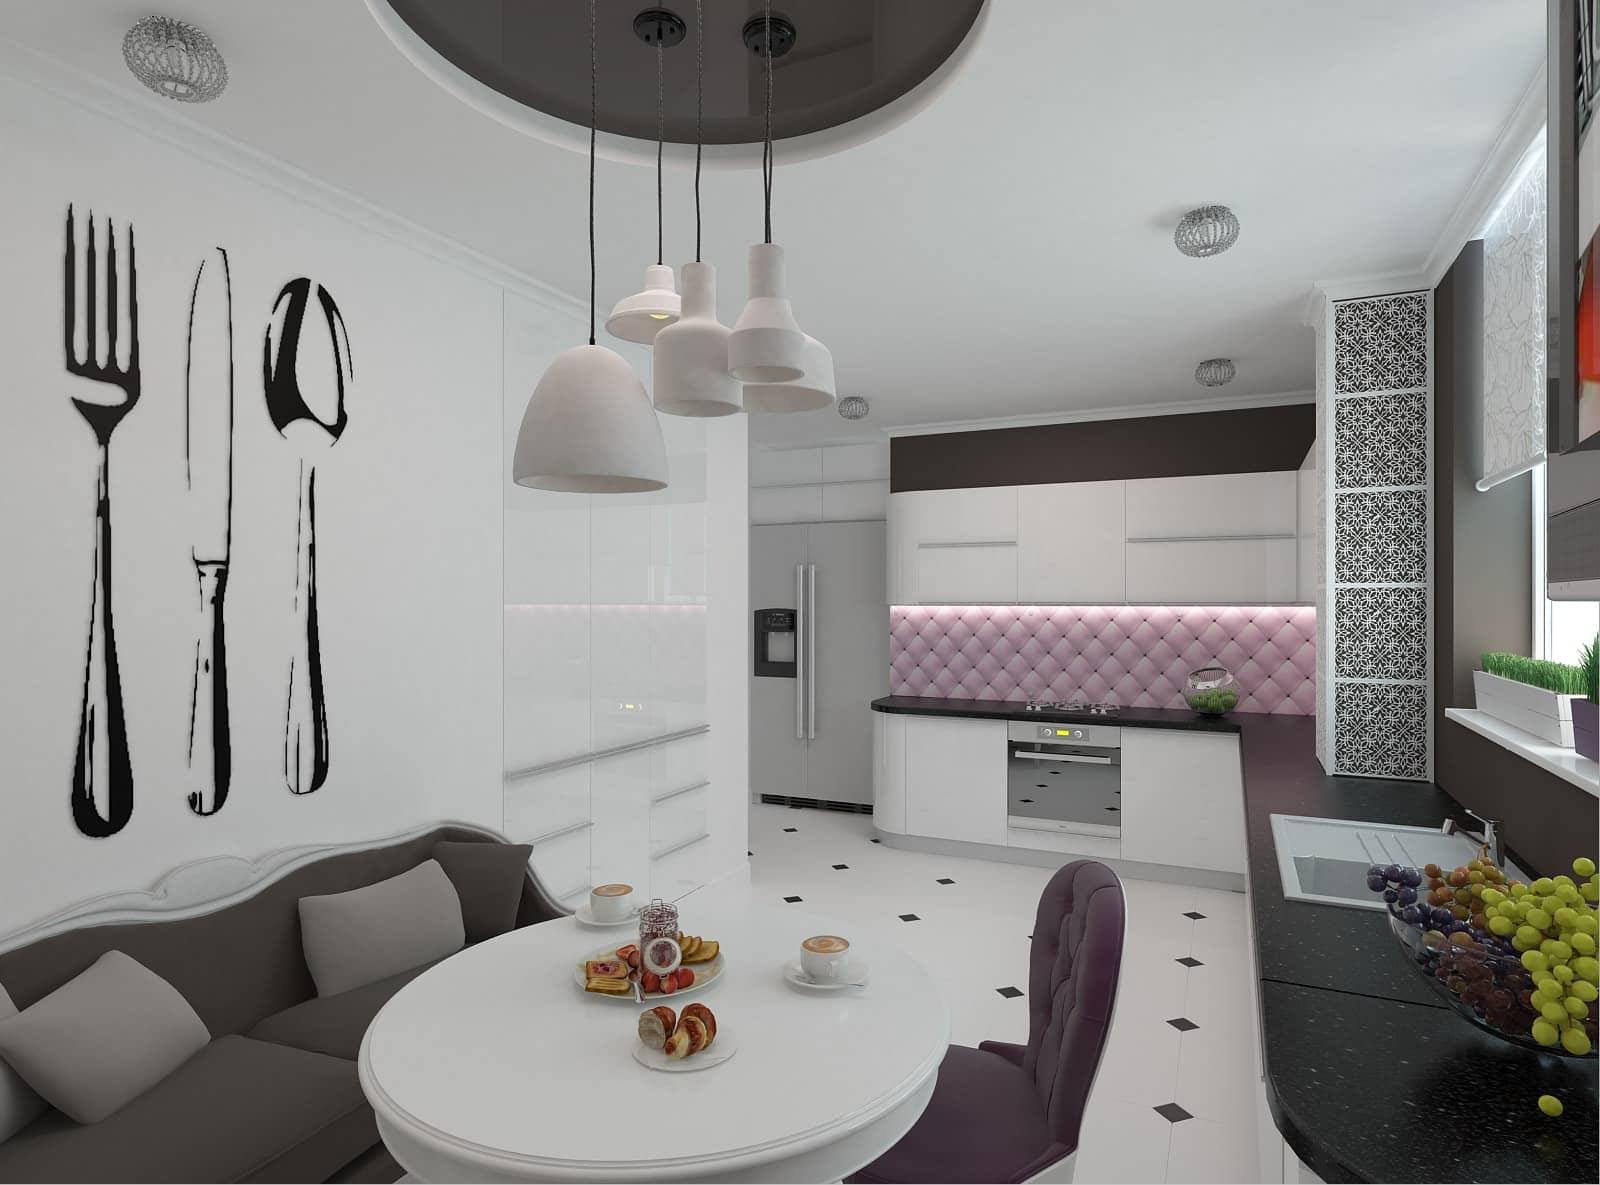 Дизайн кухні-студії: фото 1